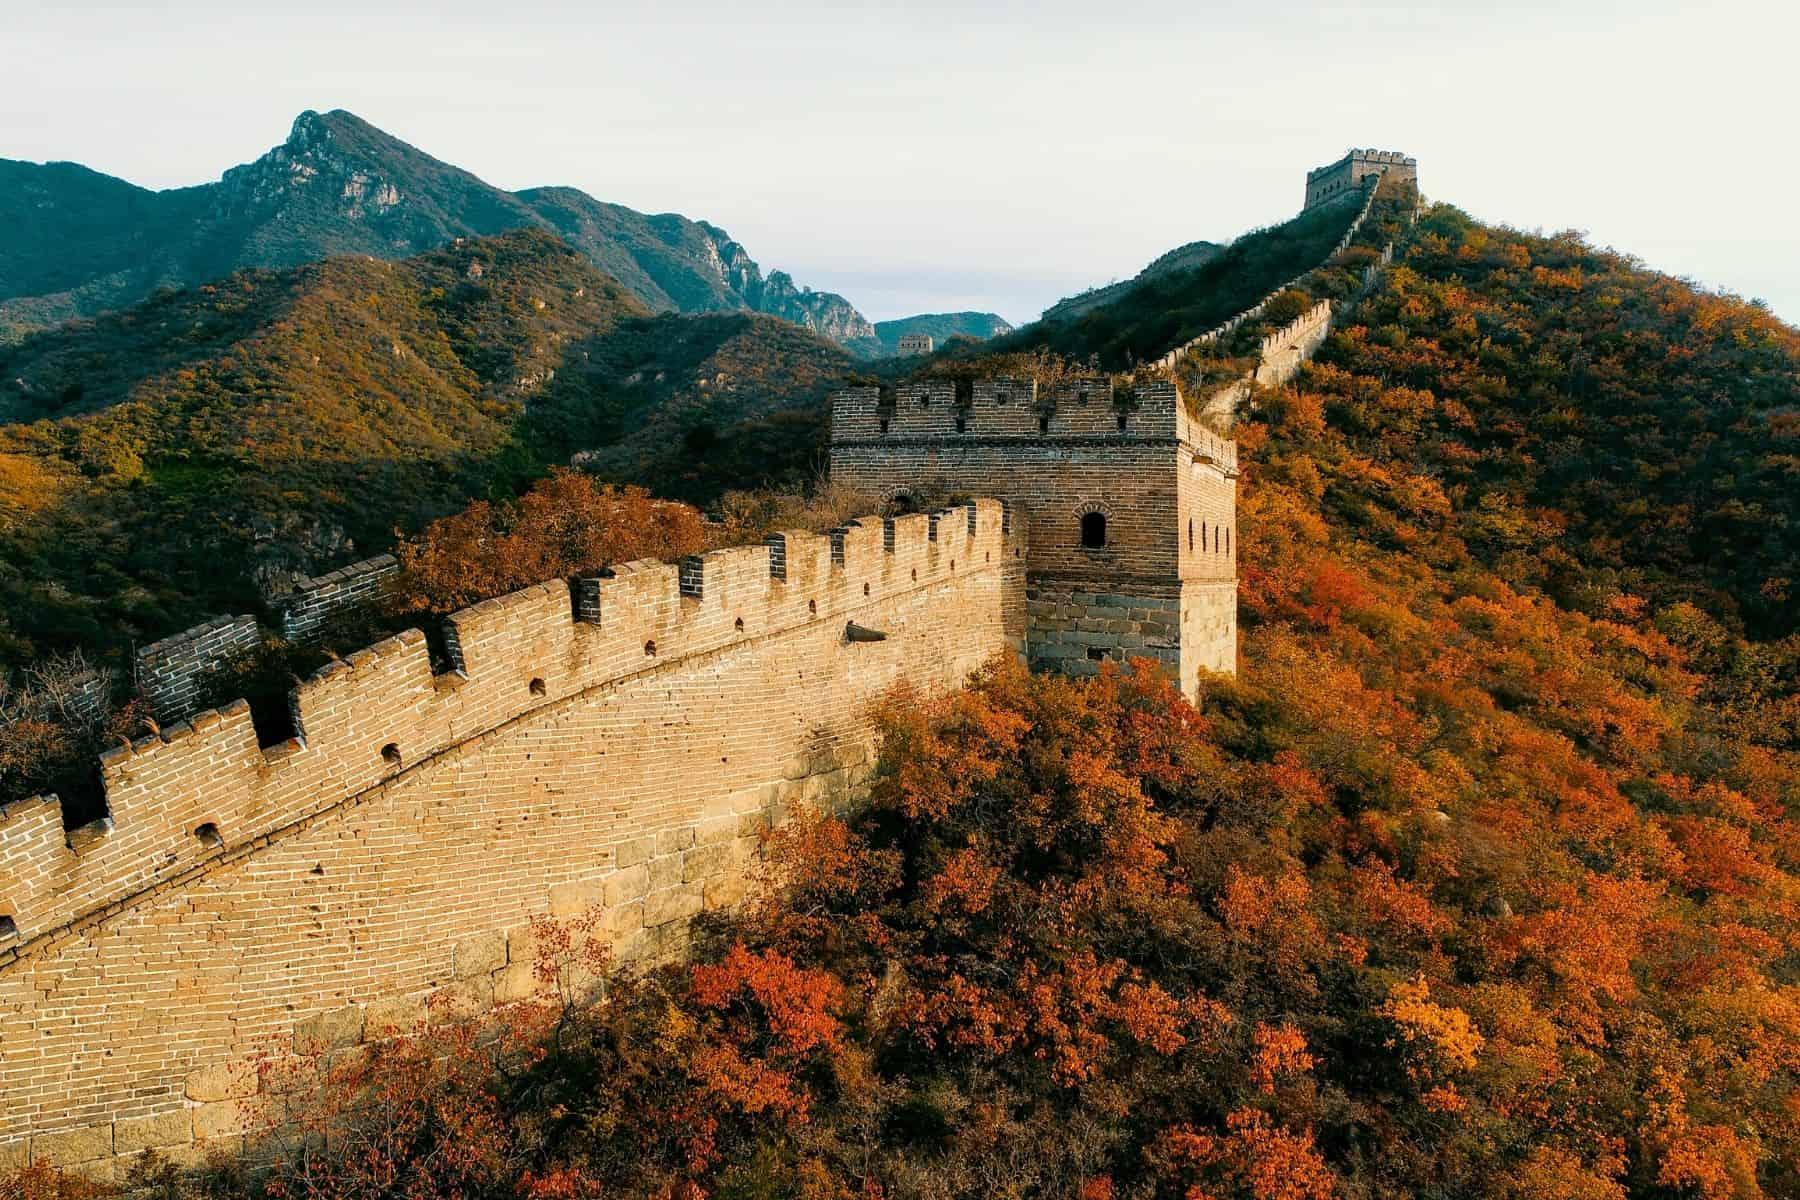 vizita la marele zid chinezesc